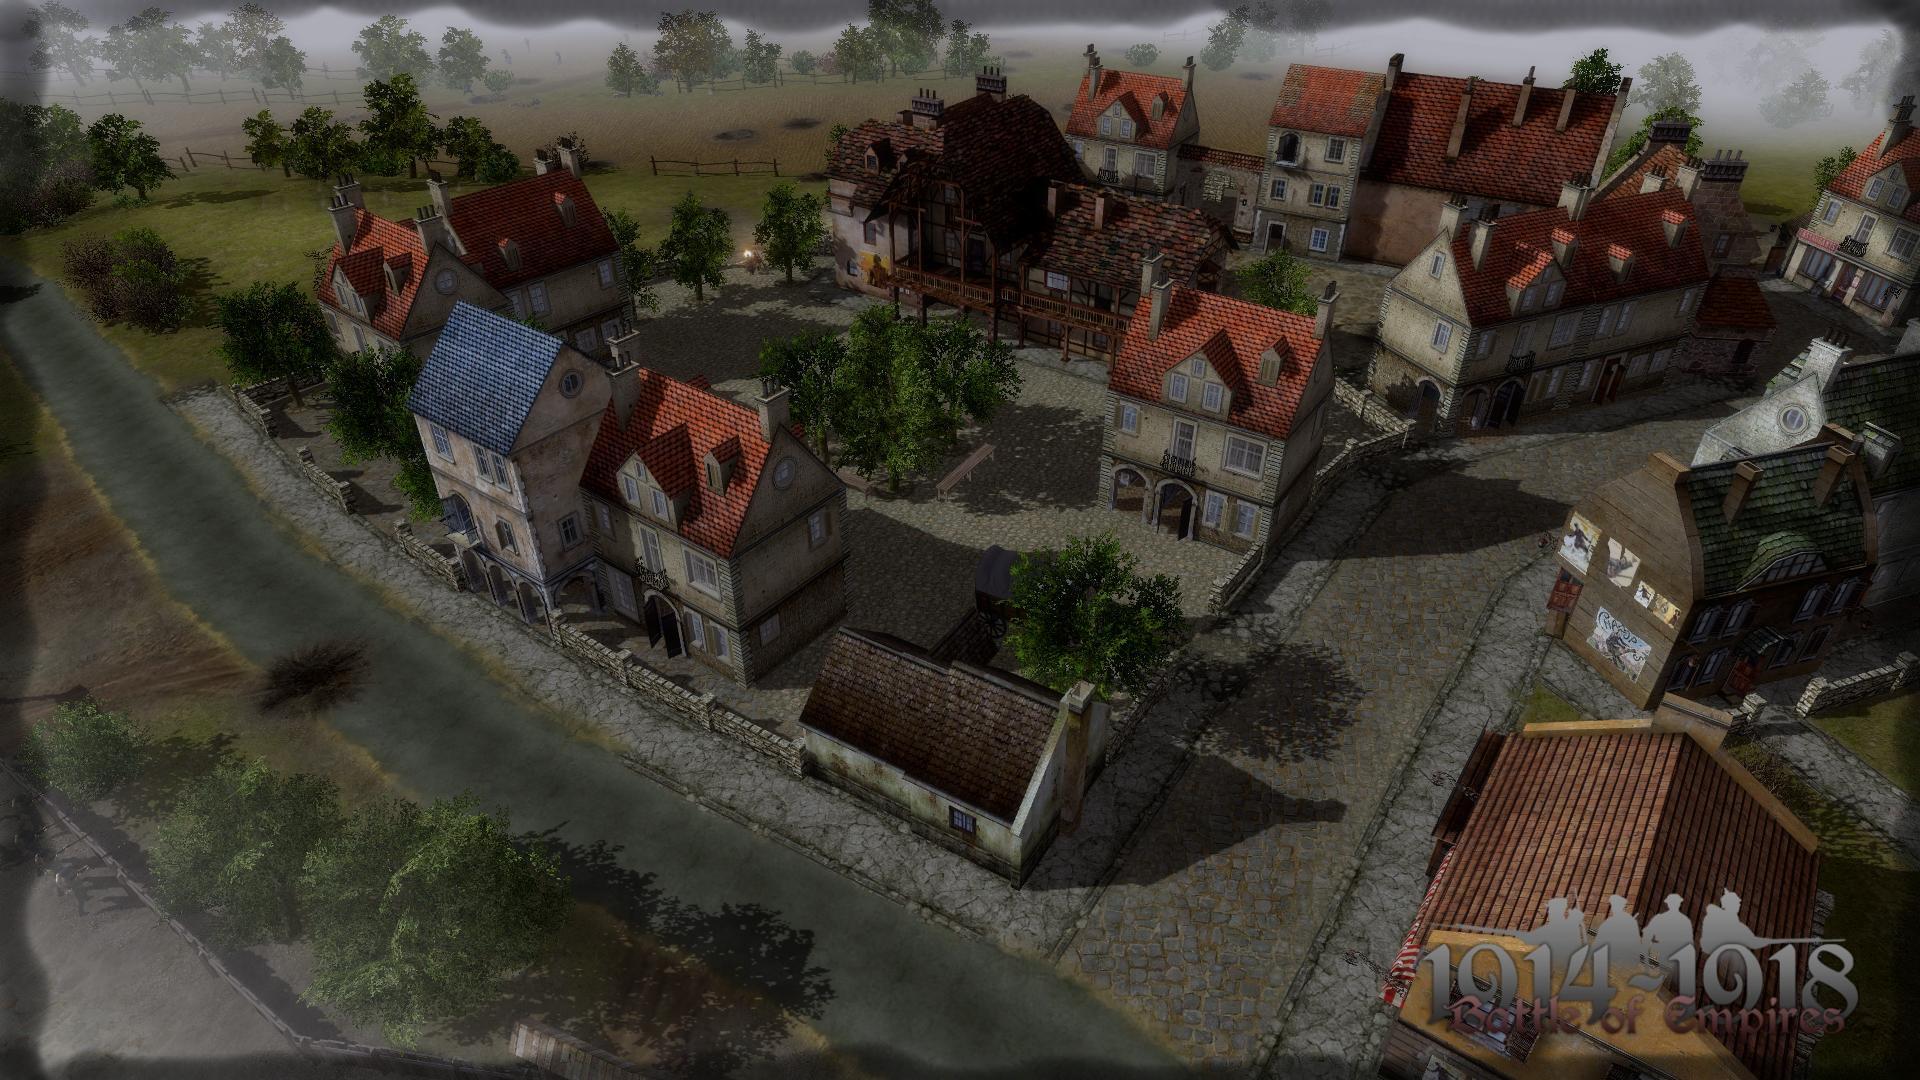 Второй скриншот Battle of Empires: 1914-1918 v1.425